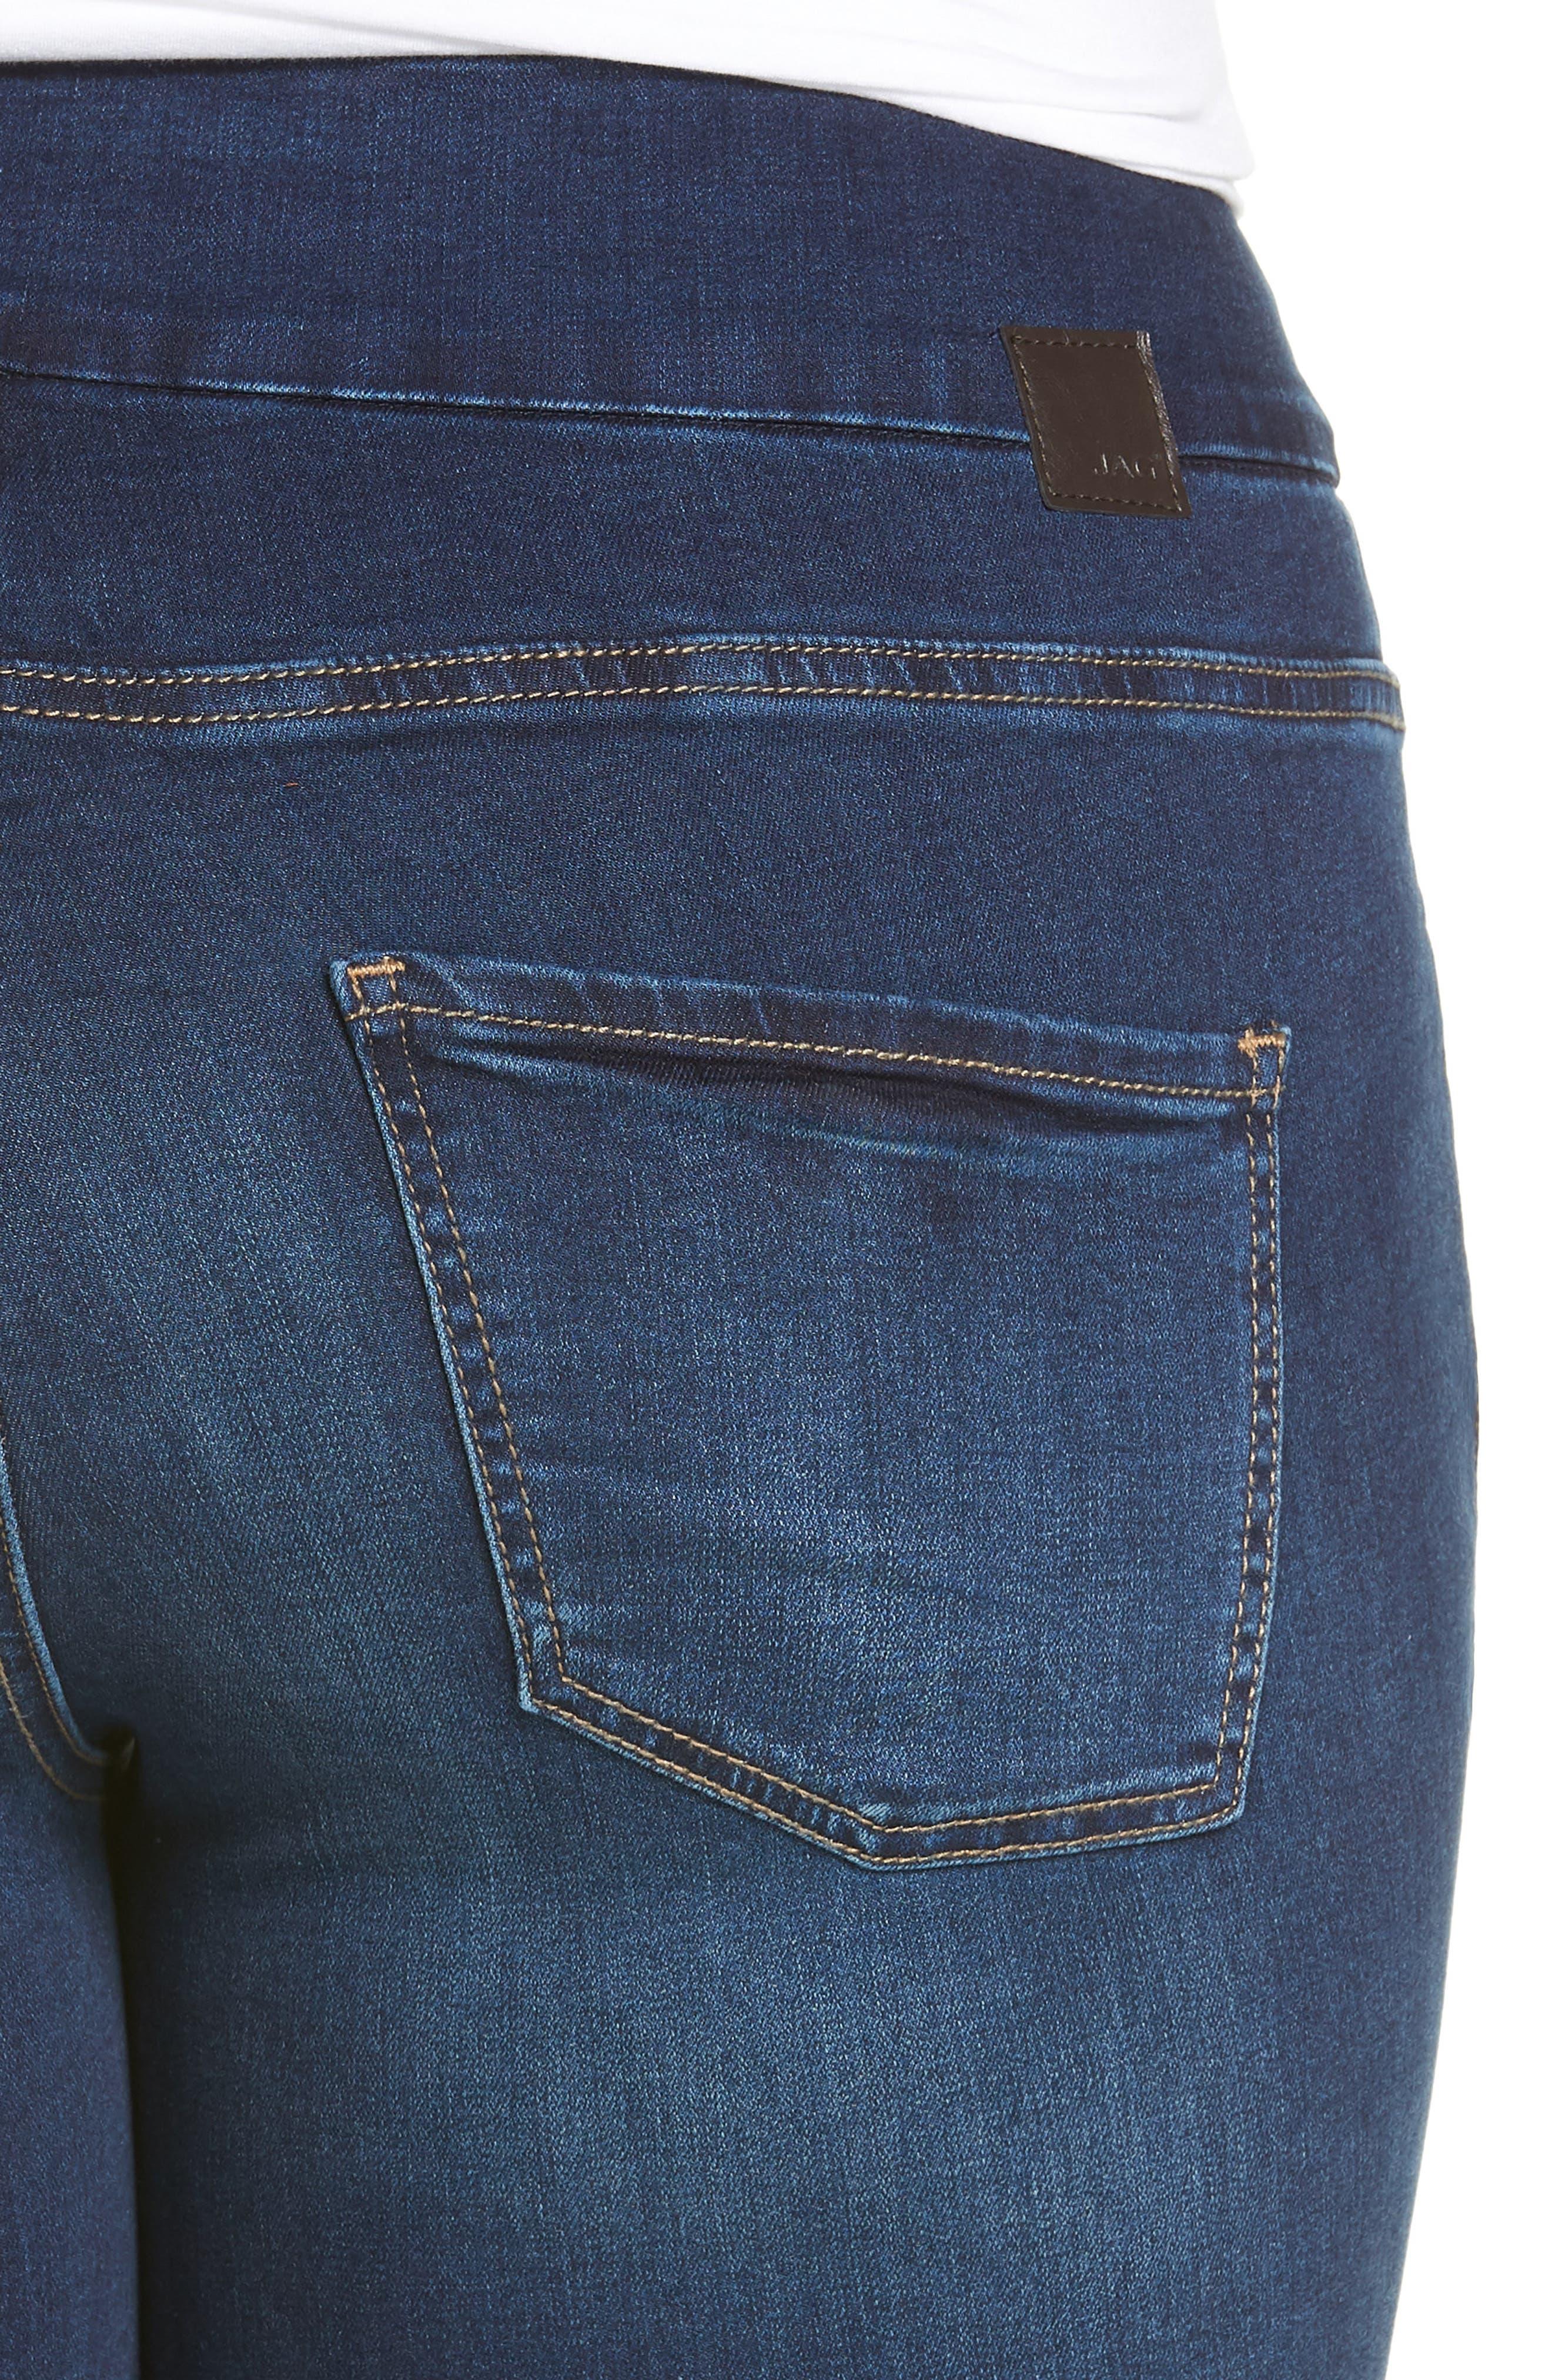 Nora Stretch Skinny Jeans,                             Alternate thumbnail 4, color,                             Med Indigo